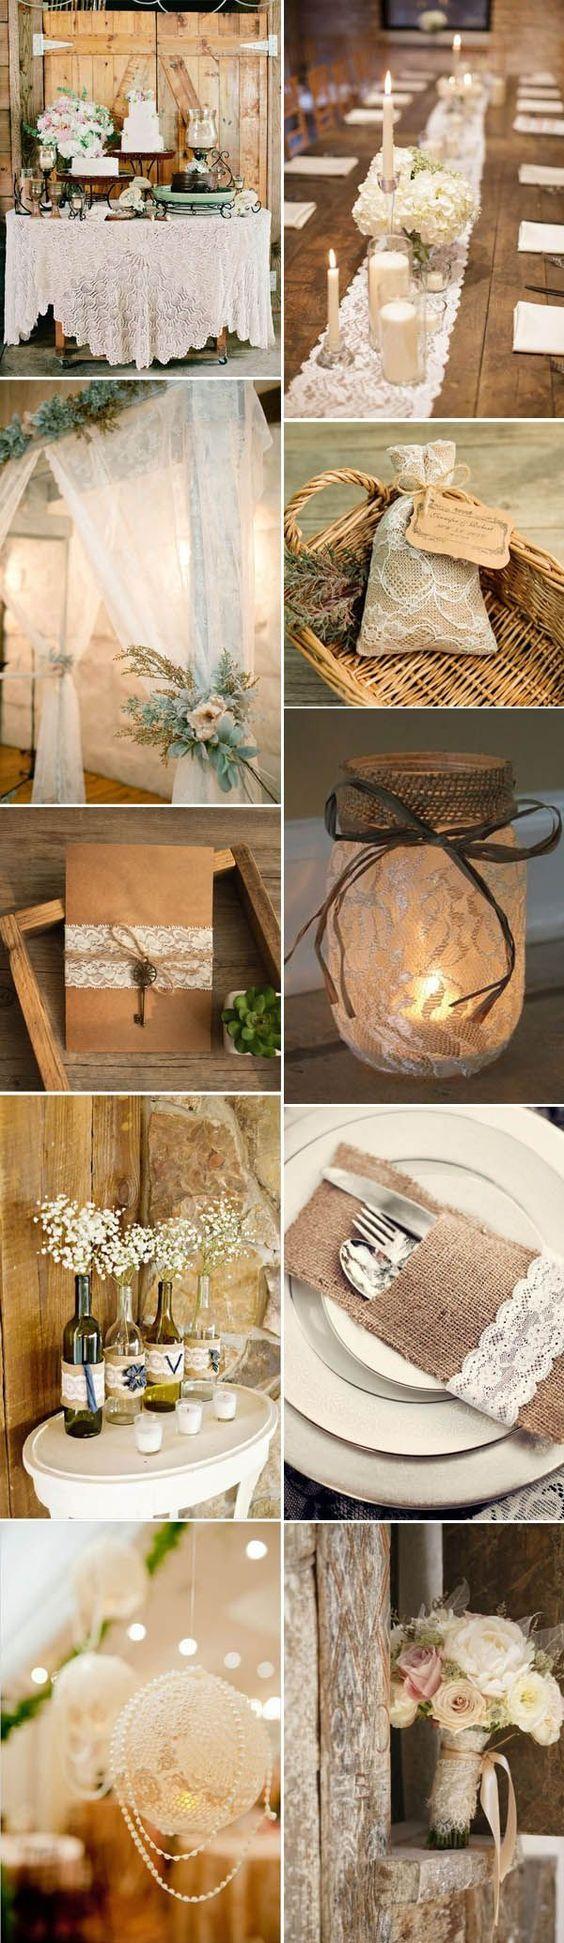 gorgeous lace rustic barn wedding ideas: